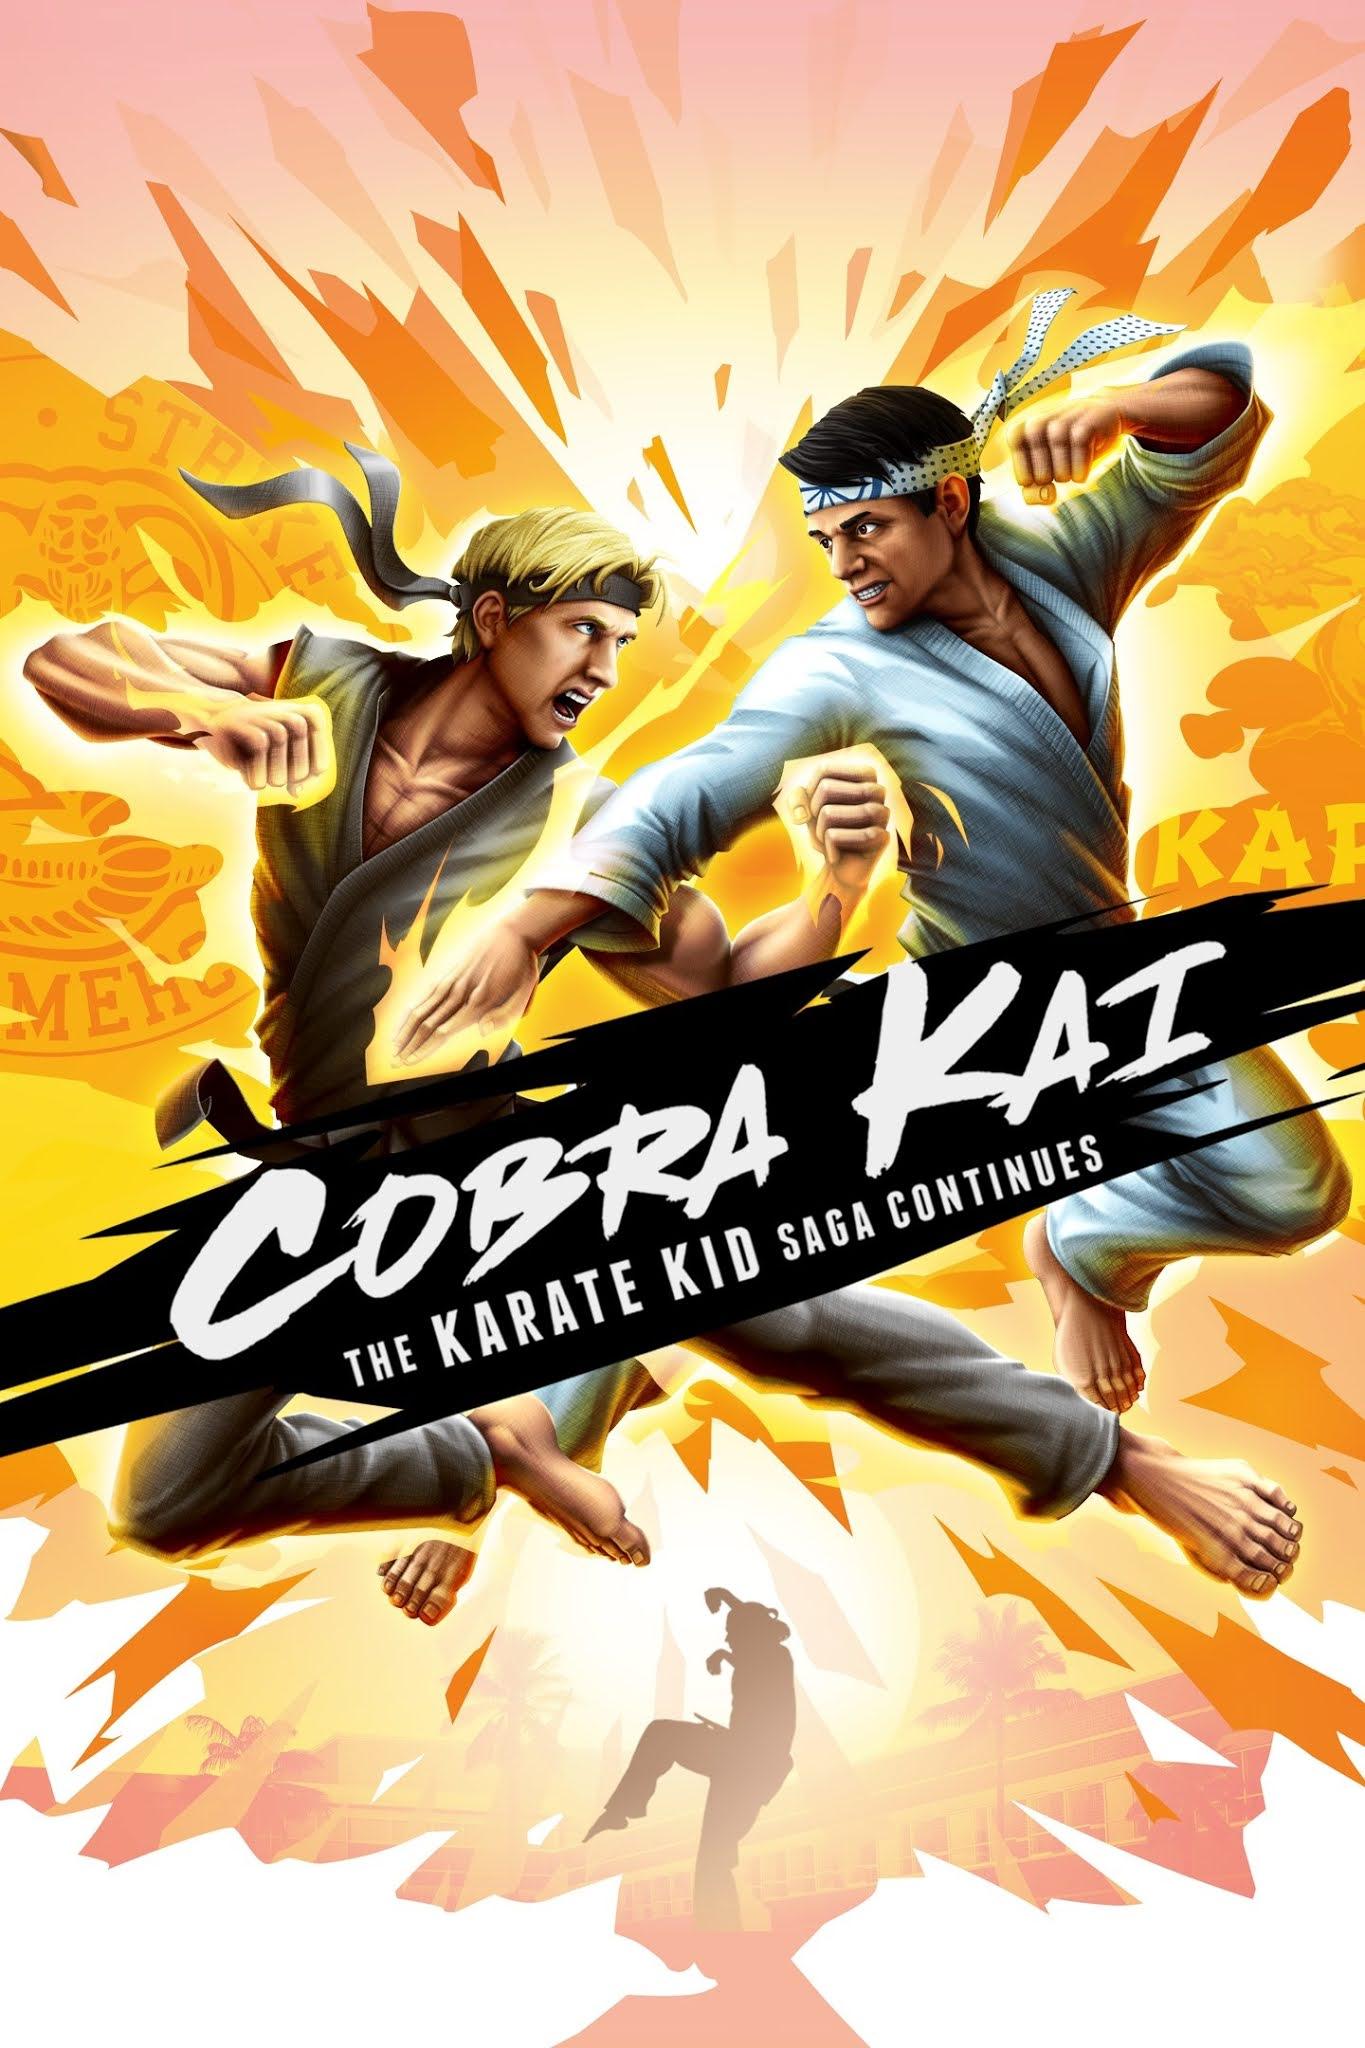 Cobra Kai The Karate Kid Saga Continues Torrent (PC)